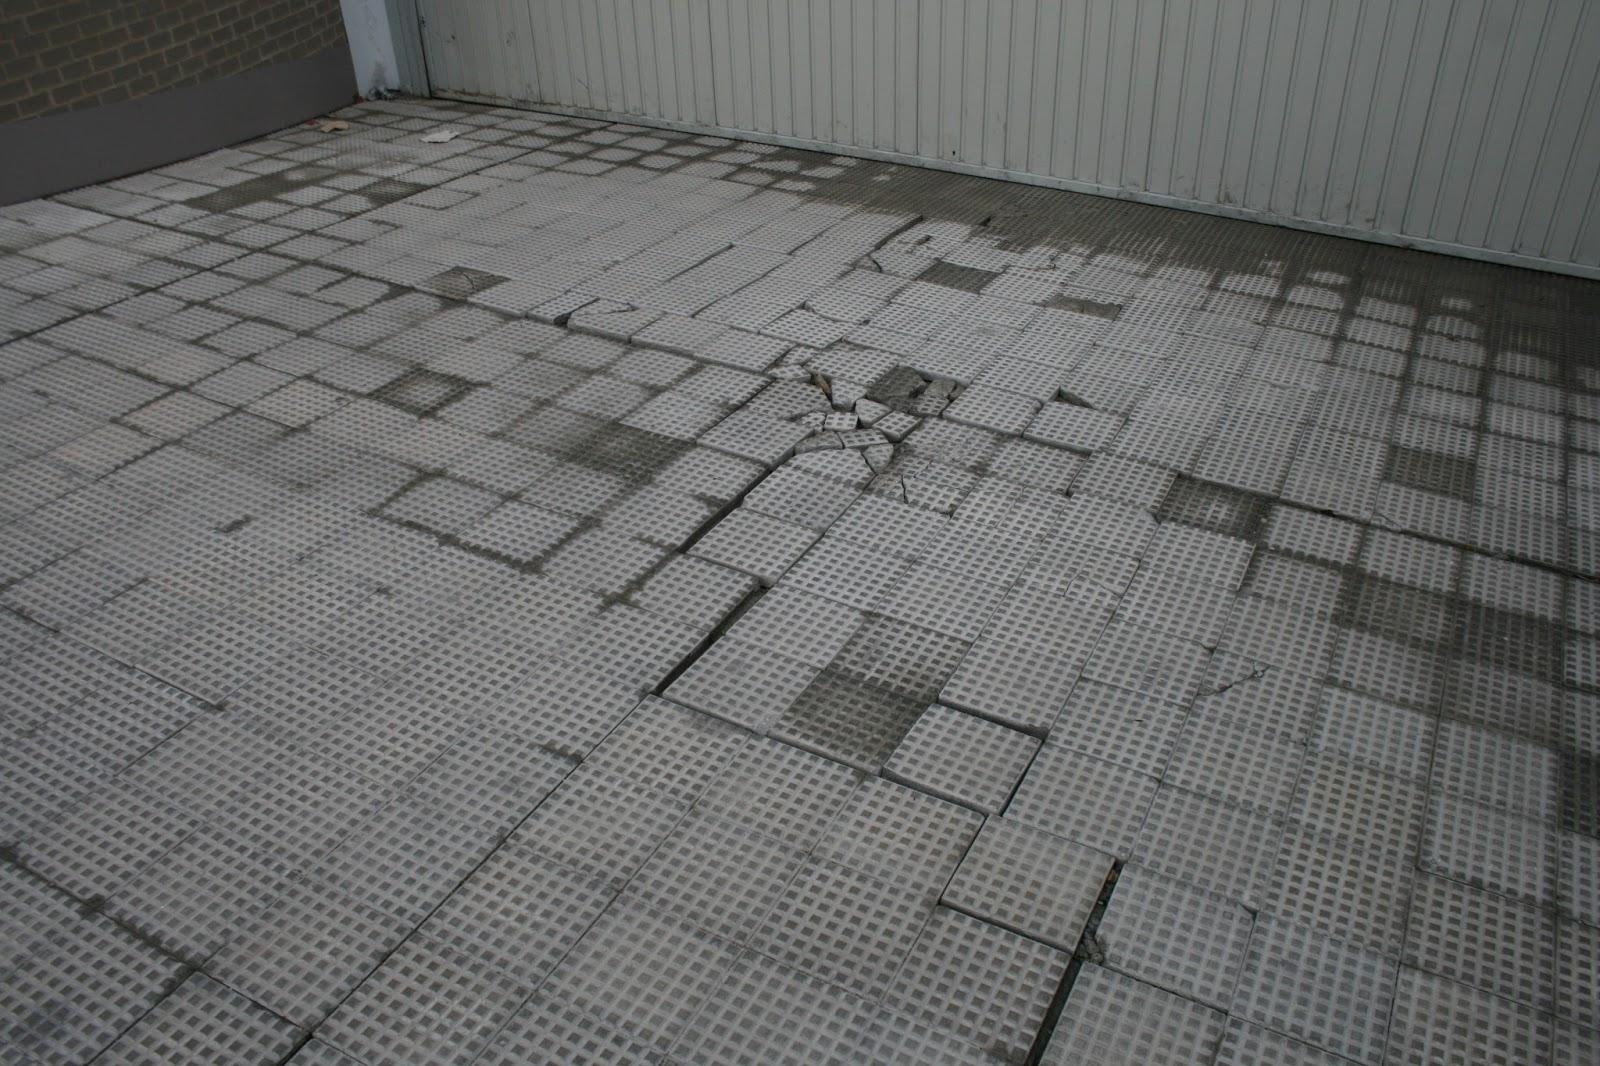 Peritararquitectura degradaci n de pavimento en rampa de - Baldosas para garajes ...